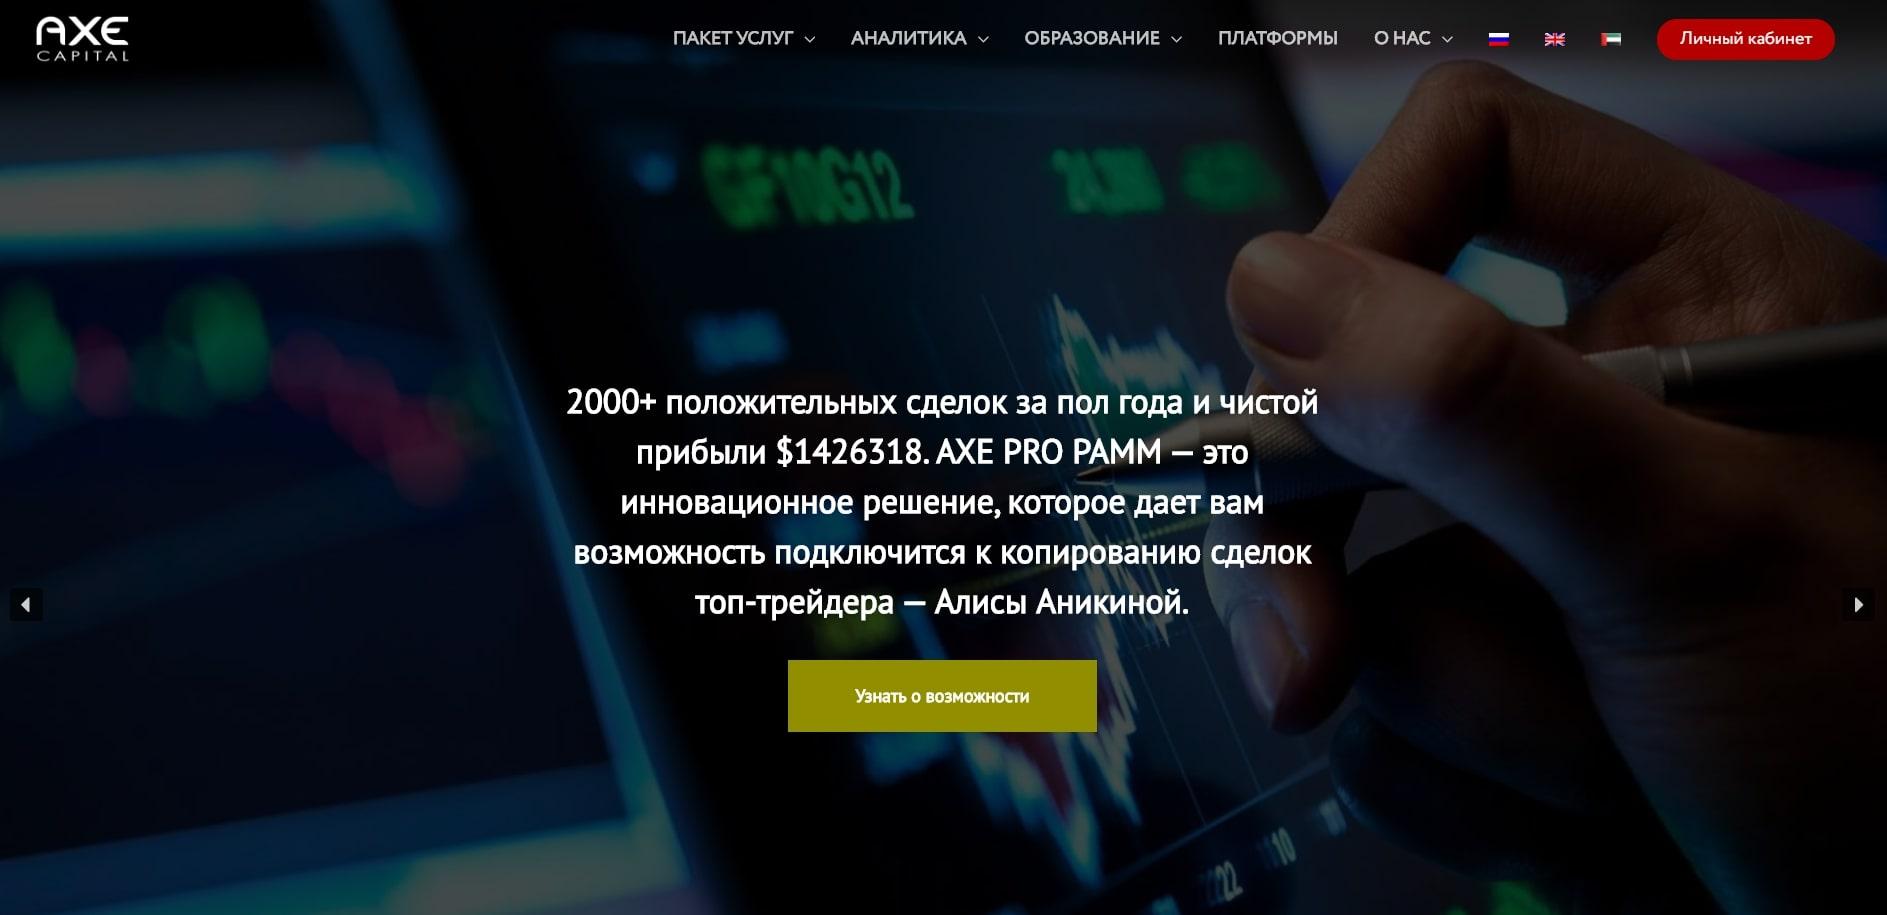 axe capital отзывы клиентов